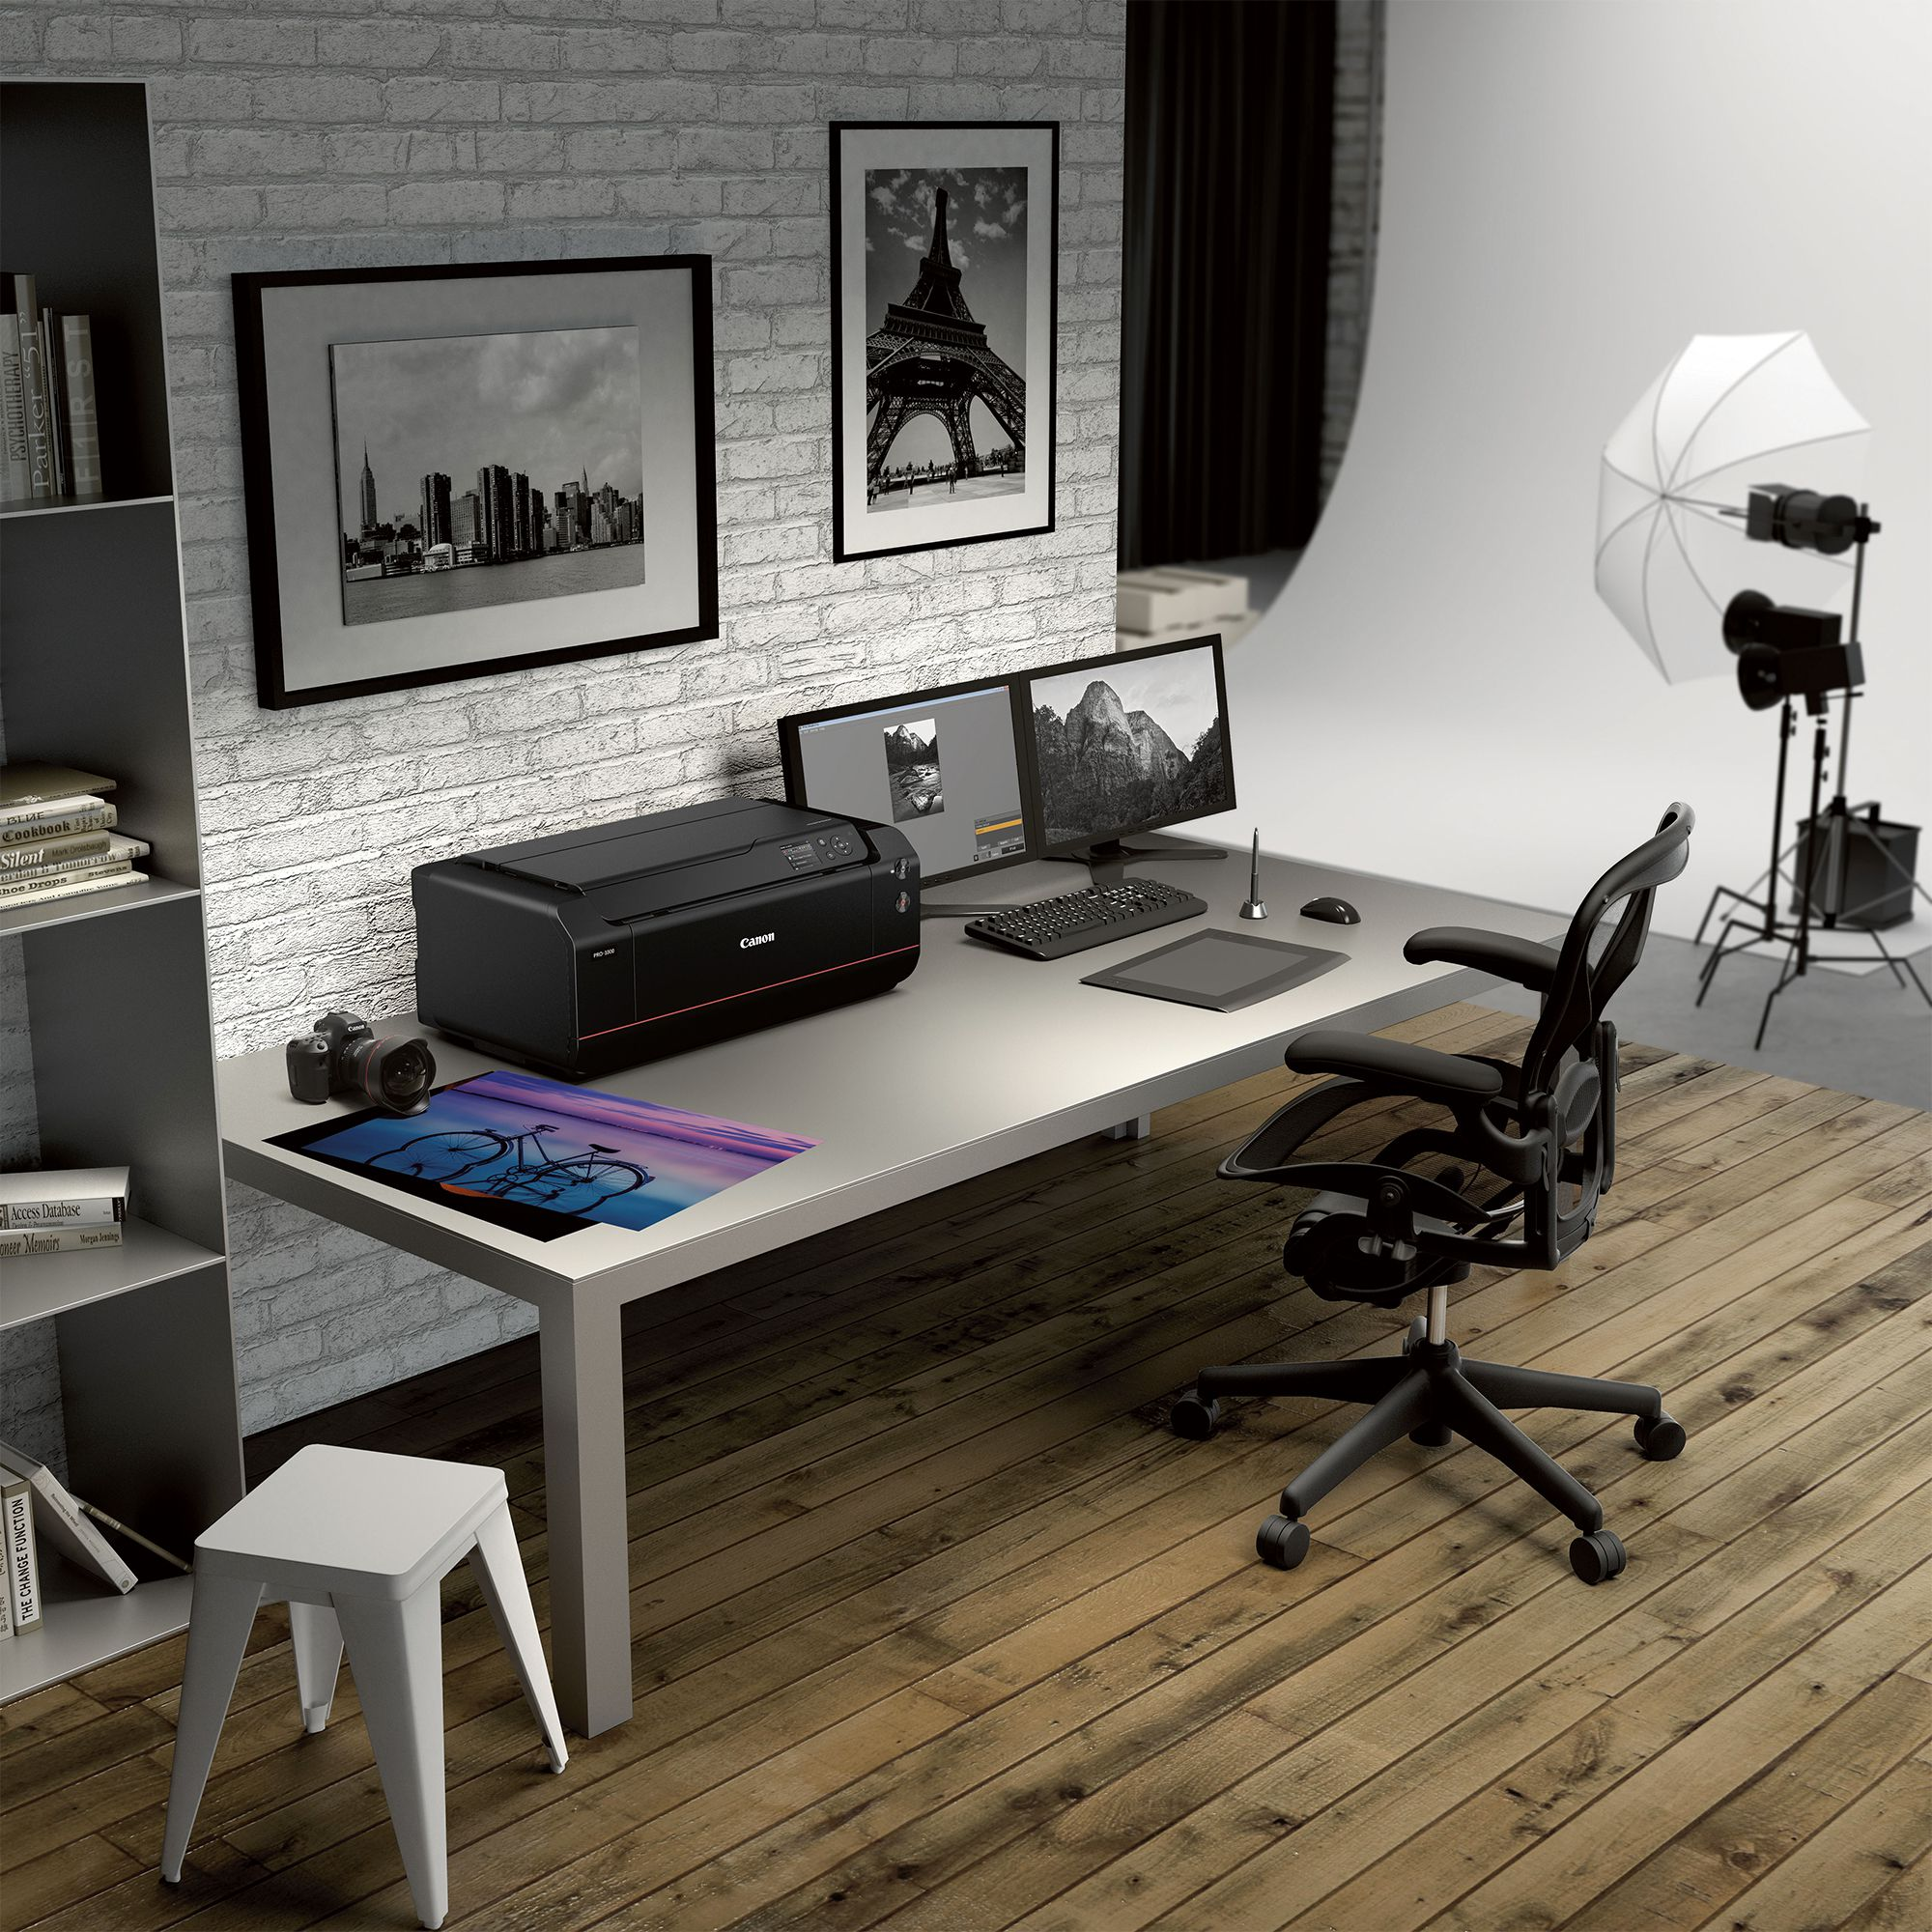 Canon imagePROGRAF Pro1000 Professional Photo Printer